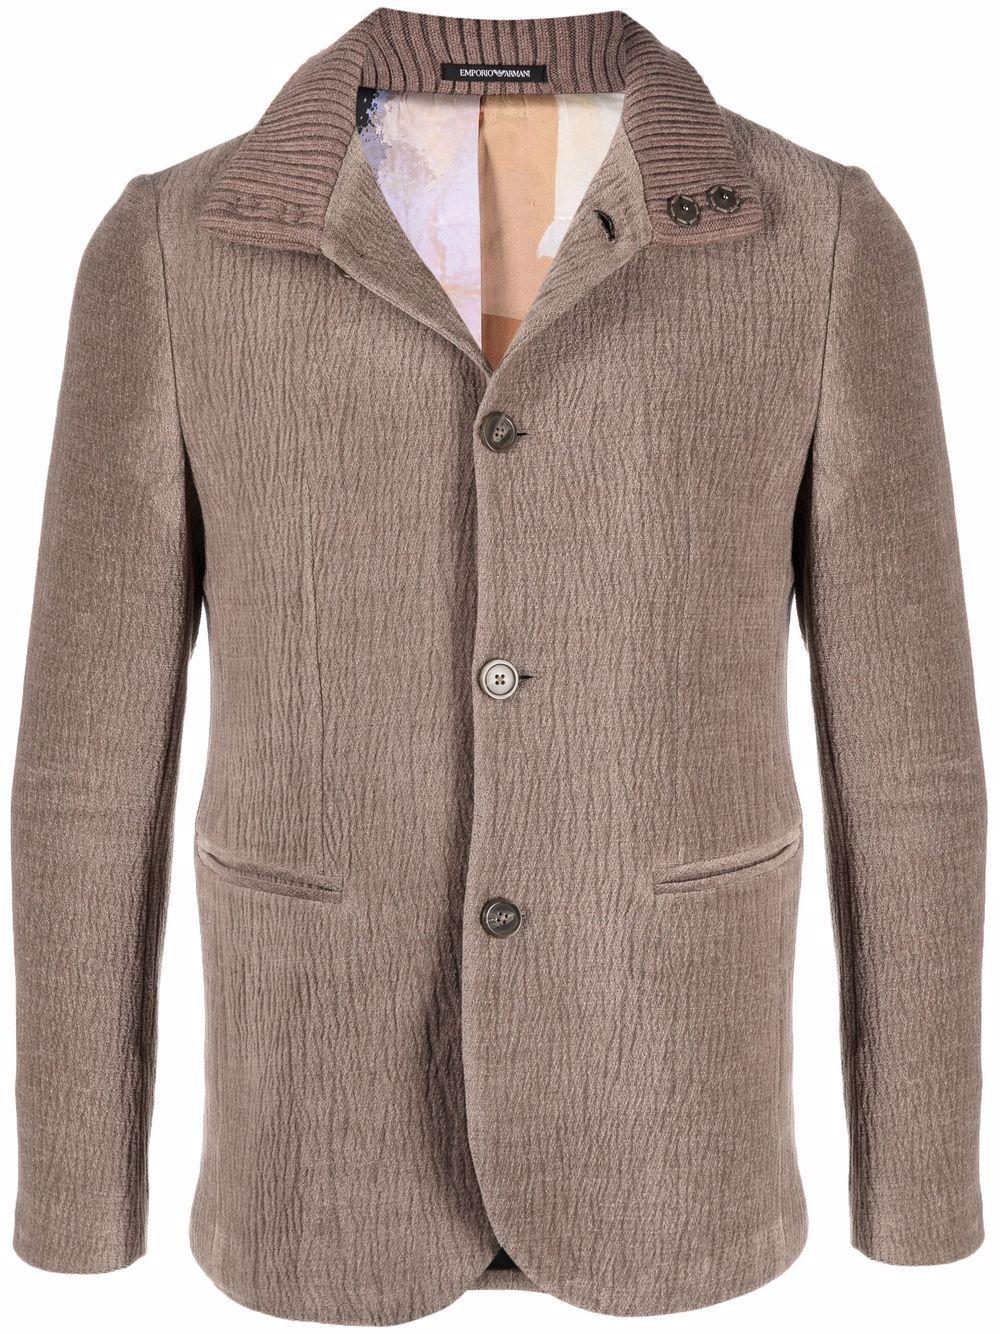 EMPORIO ARMANI- Cotton Blazer- Man- 52 - Beige